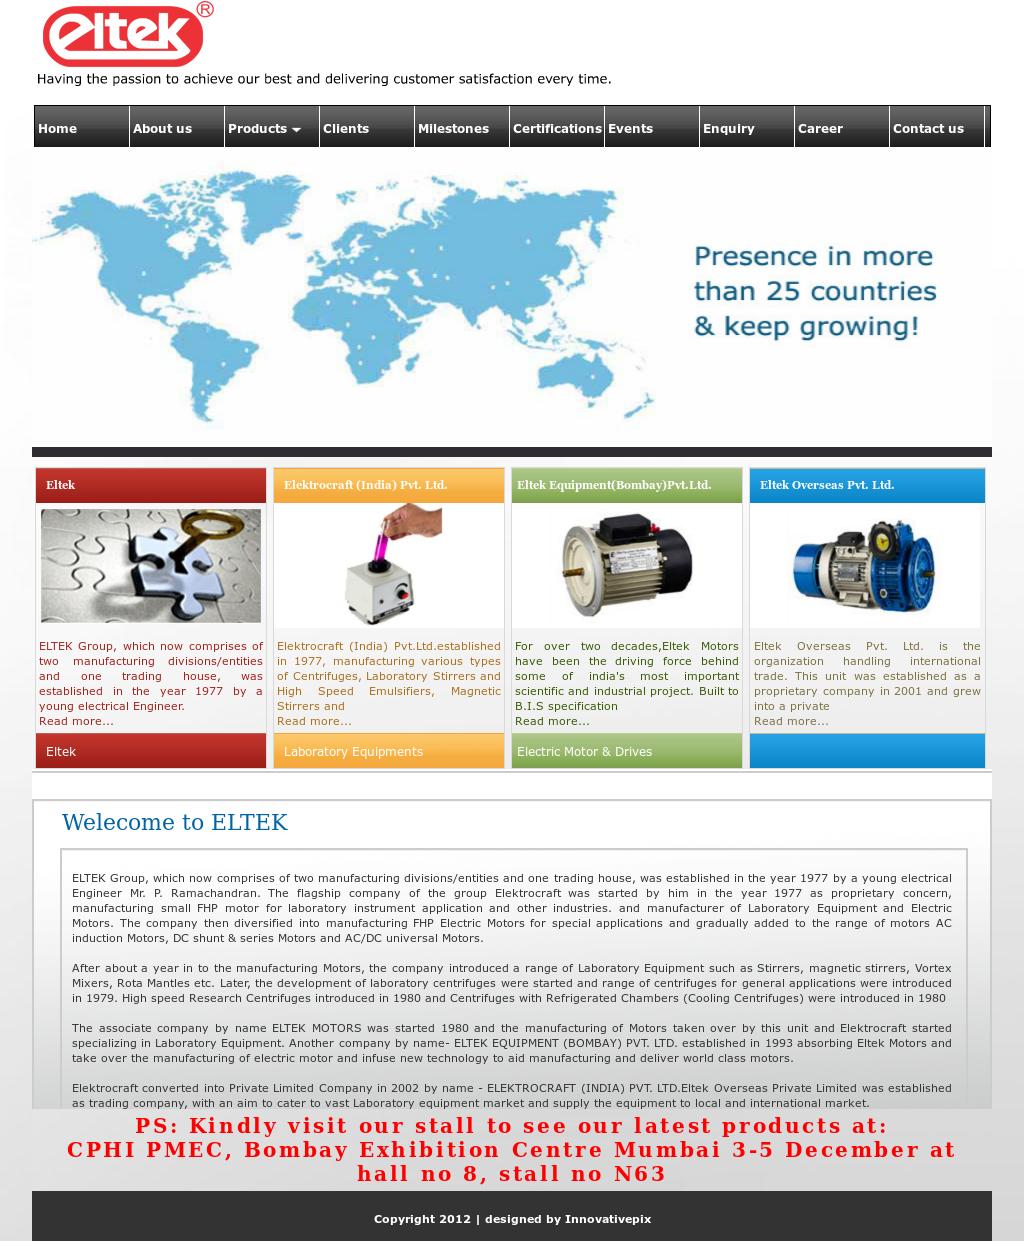 Eltek Equipment (Bom) Competitors, Revenue and Employees